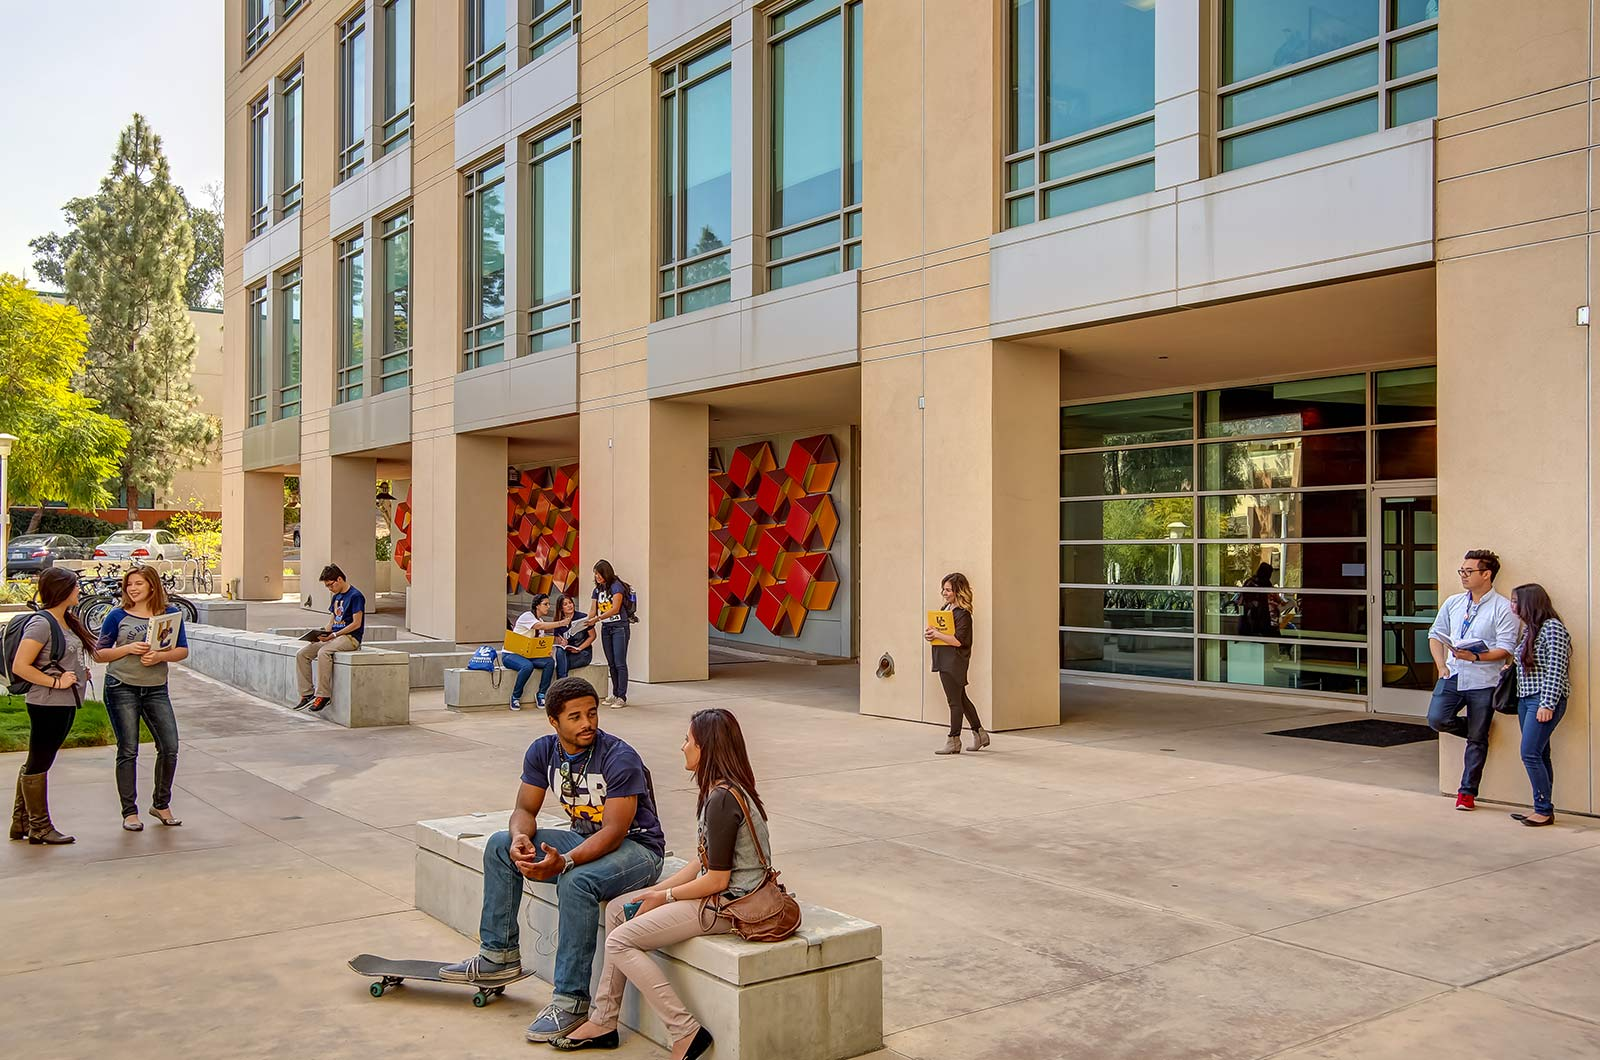 Social-Break-Space-At-University-Virtual-Tour-For-College-College-Virtual-Tours-360-Tours-University-Virtual-Tours-University-Photography-Company